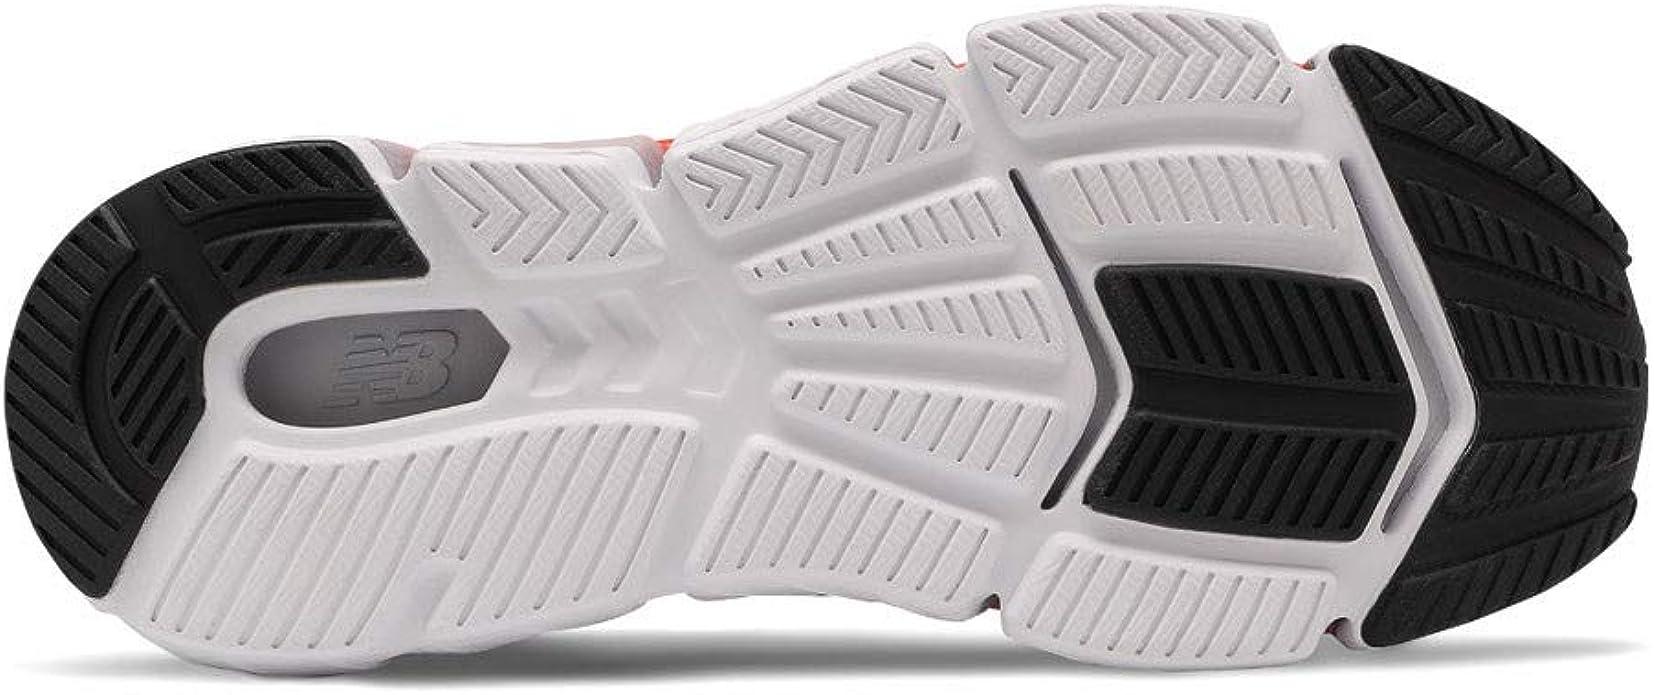 New Balance Rubix Zapatillas para Correr (2E Width) - SS20: Amazon ...